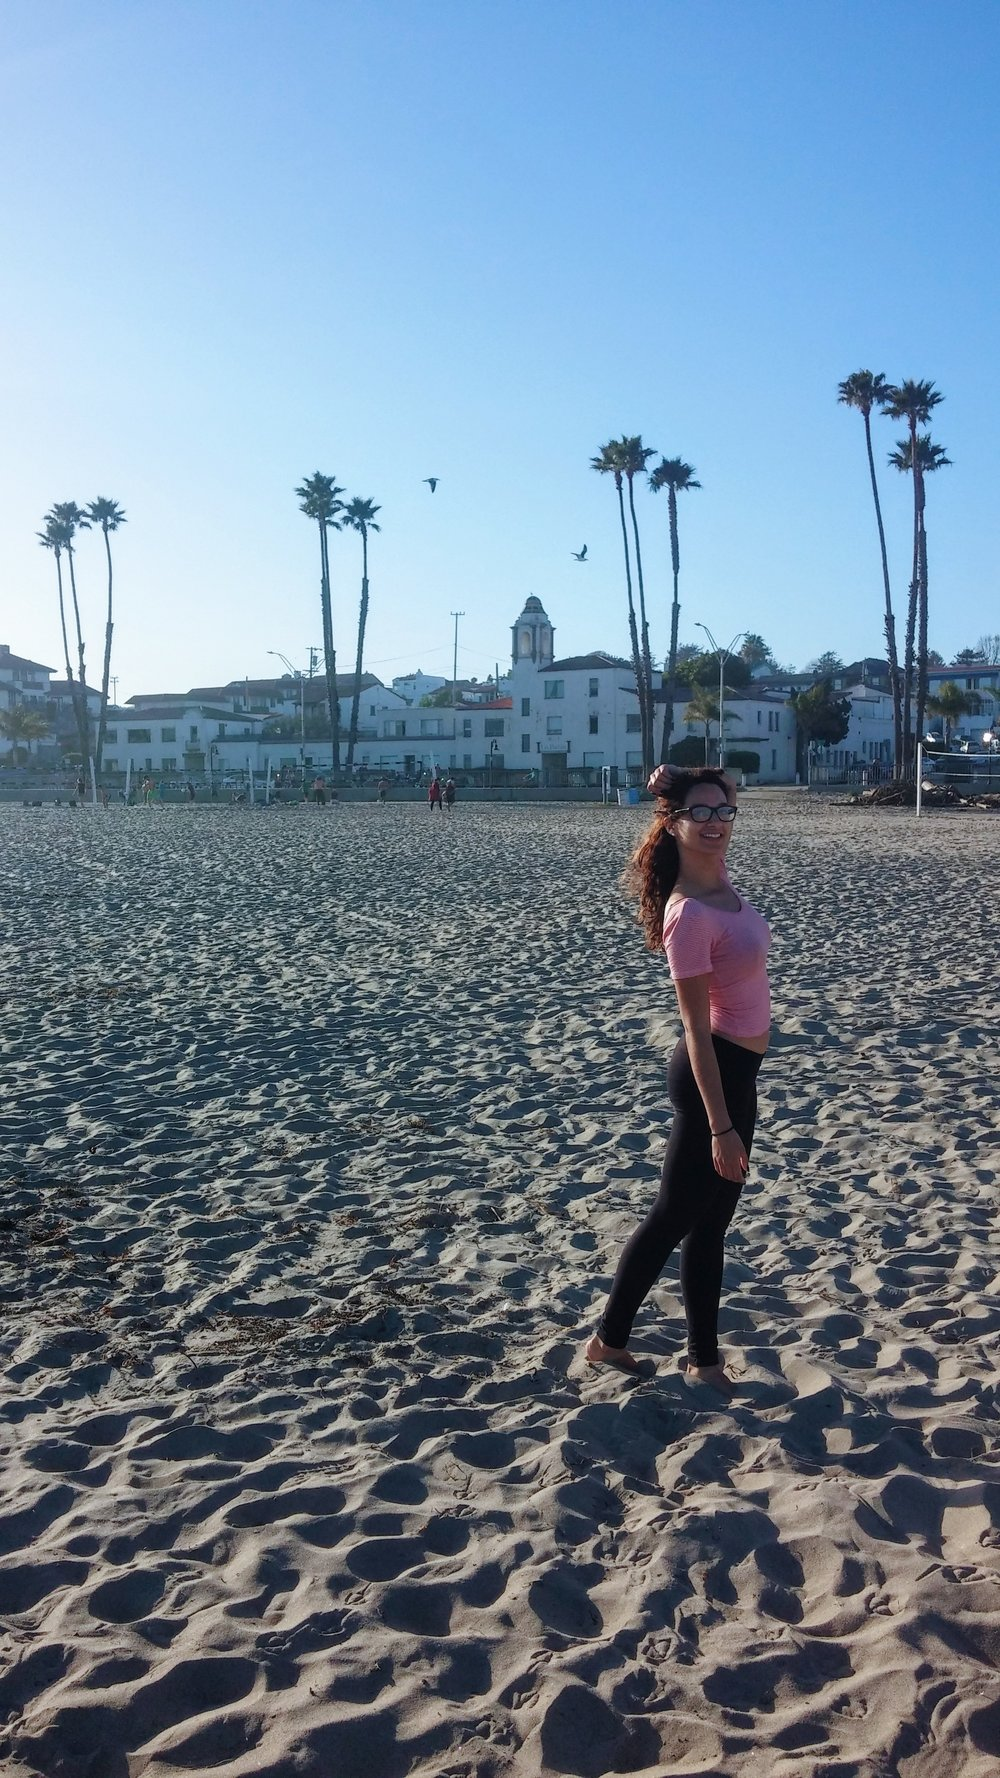 santa cruz, california, places to visit, california loving, explore, solo travel.jpg